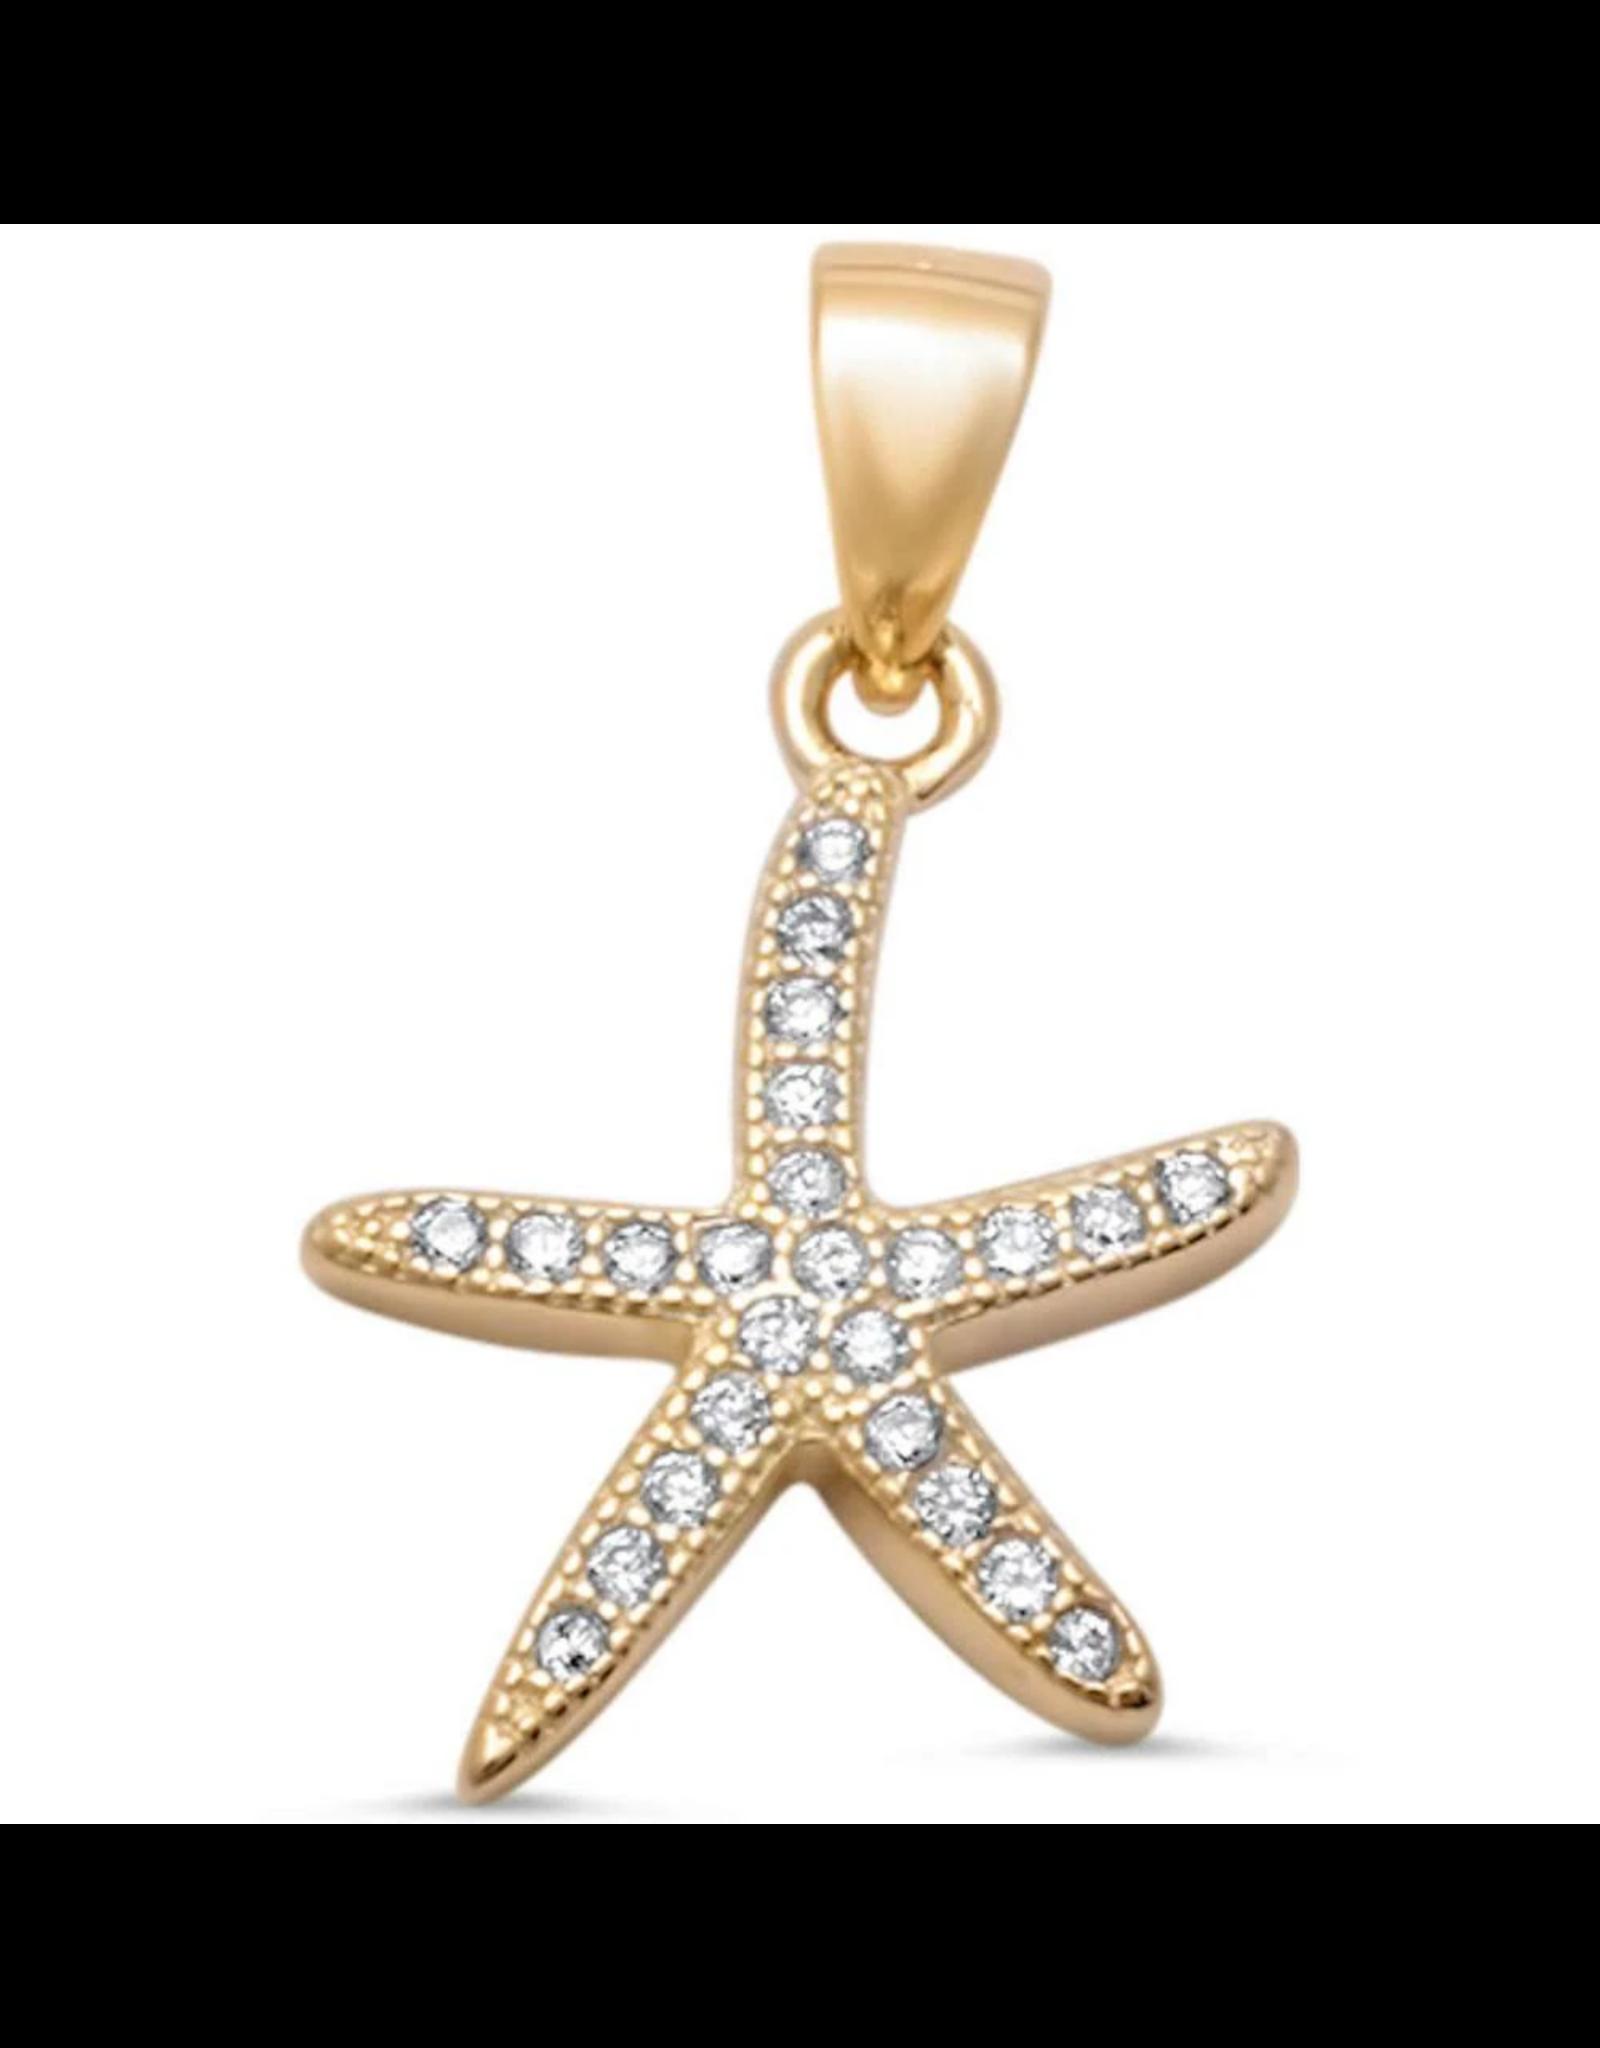 Sonara Jewelry GP CZ Small Starfish